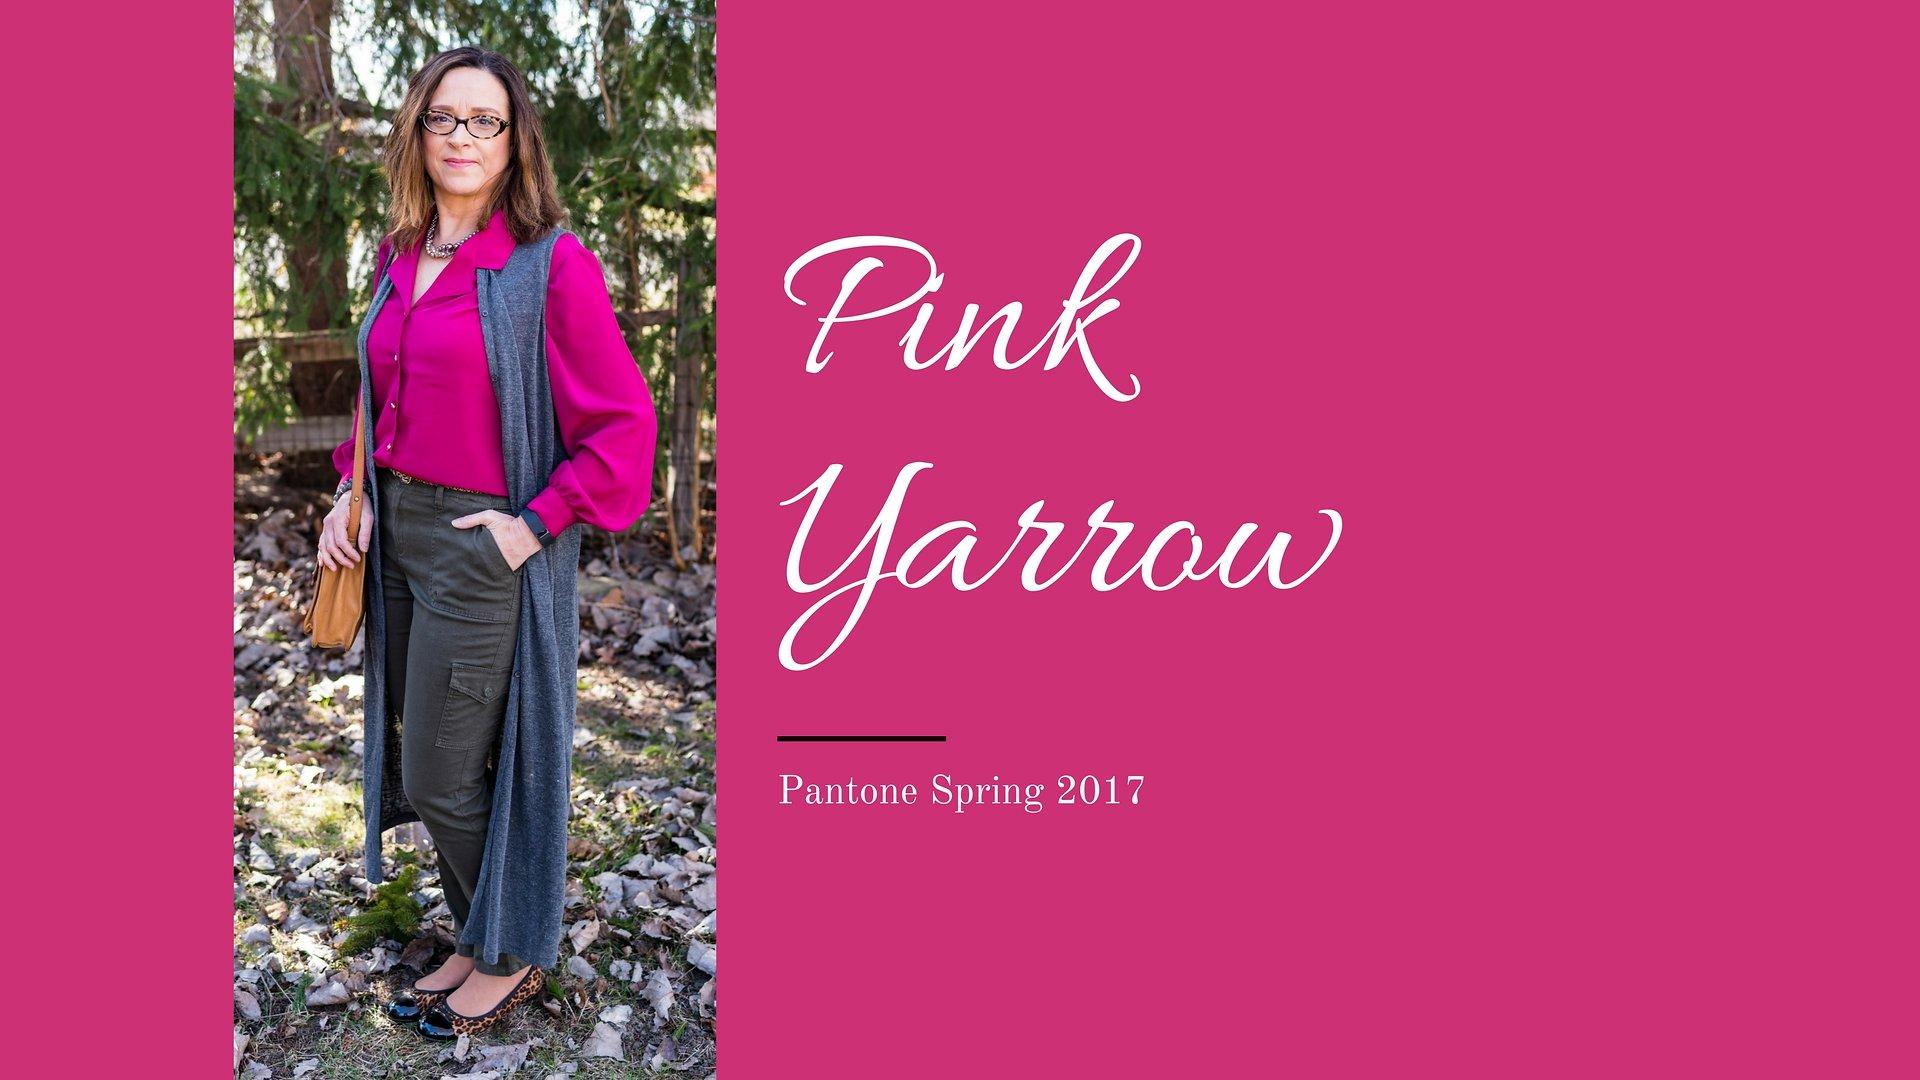 Pantone Spring 2017 - Pink Yarrow